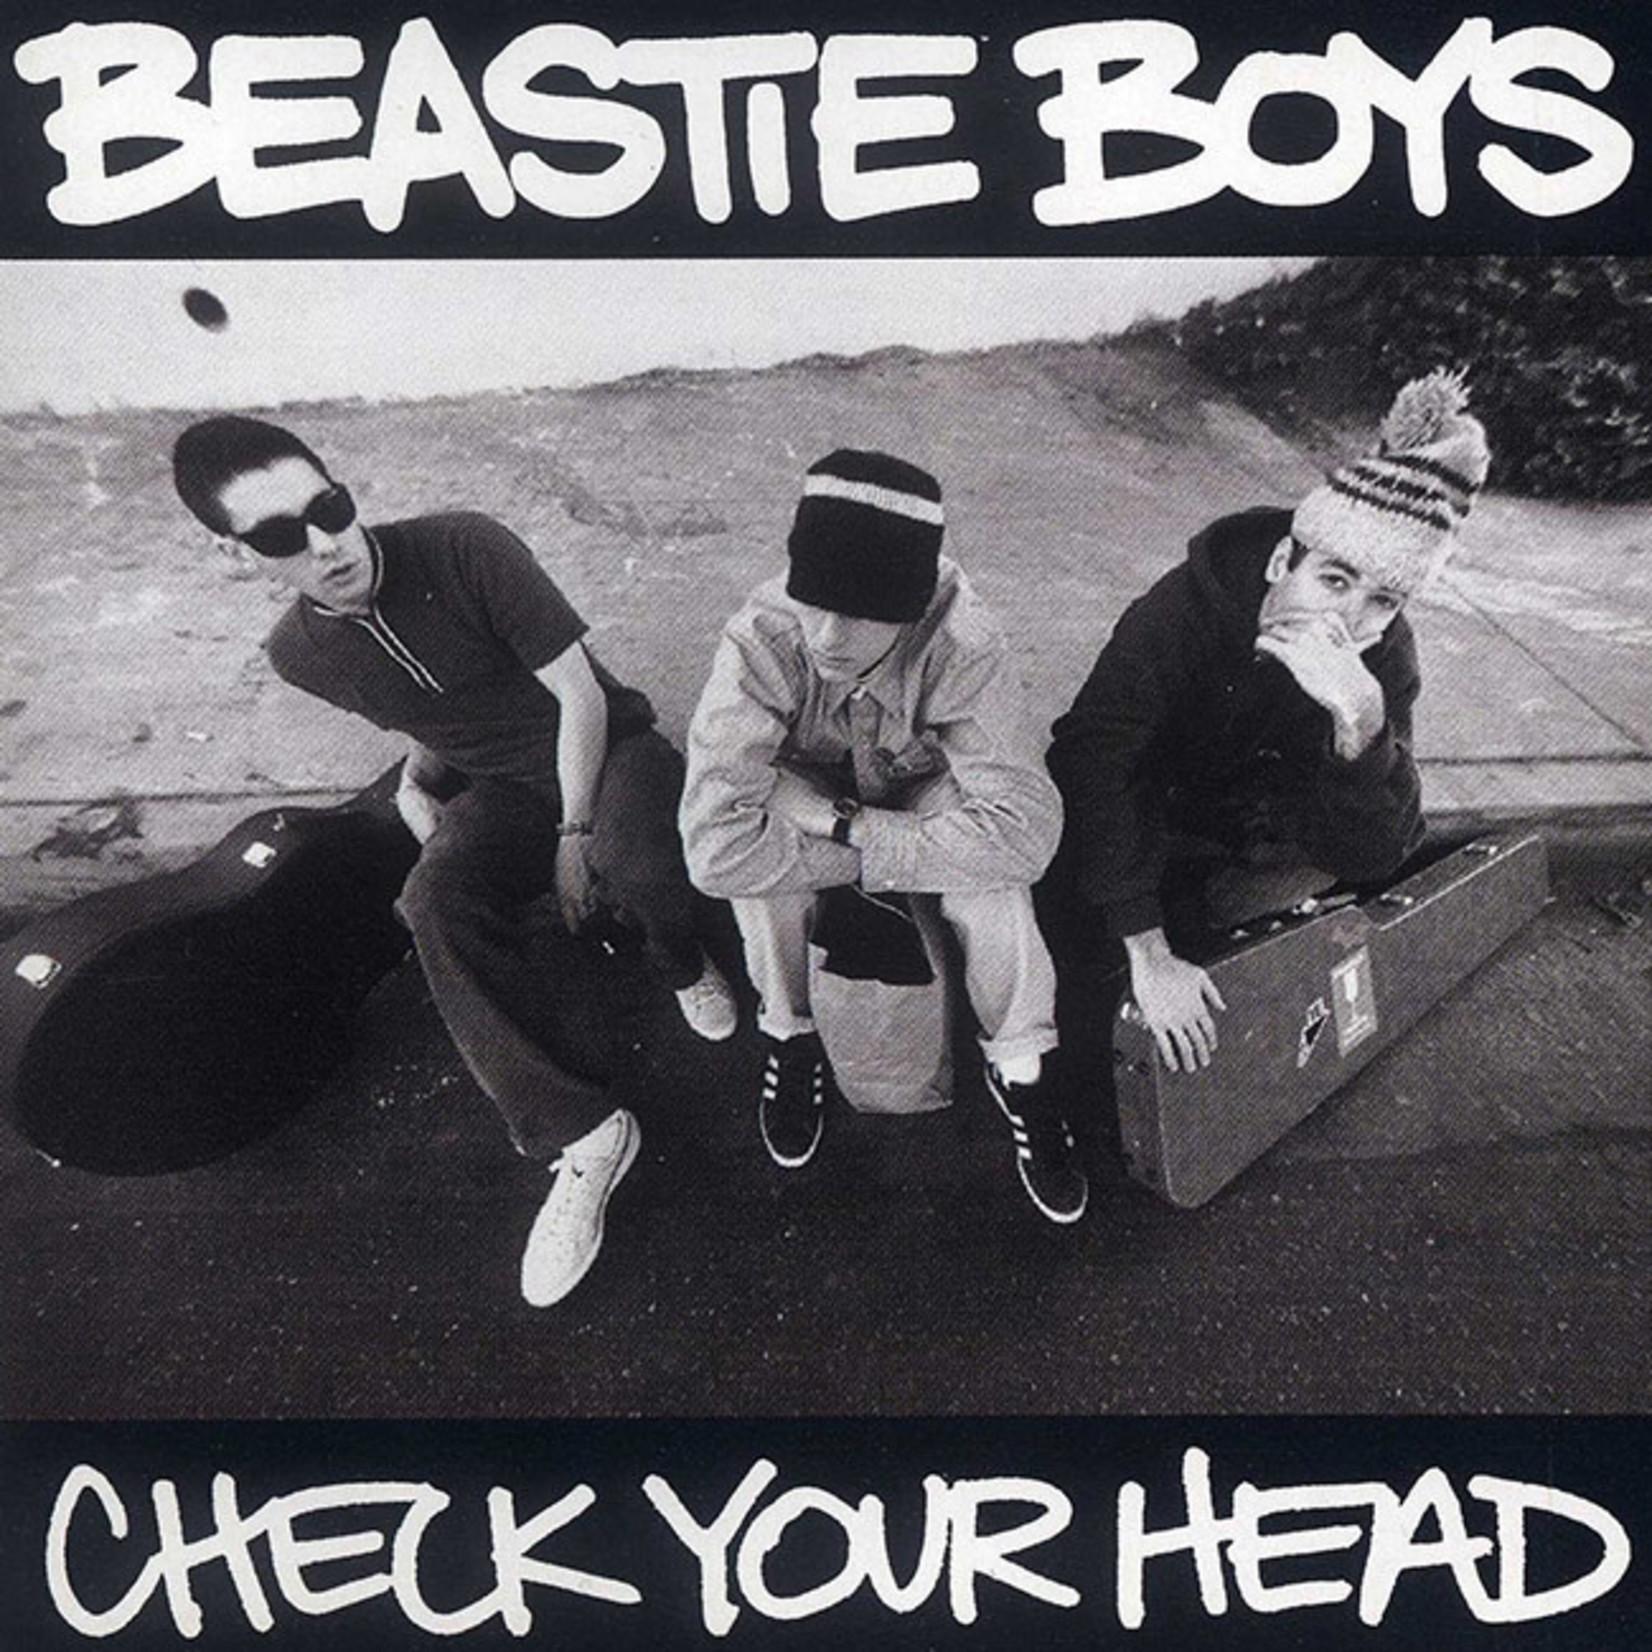 [New] Beastie Boys: Check Your Head (2LP)